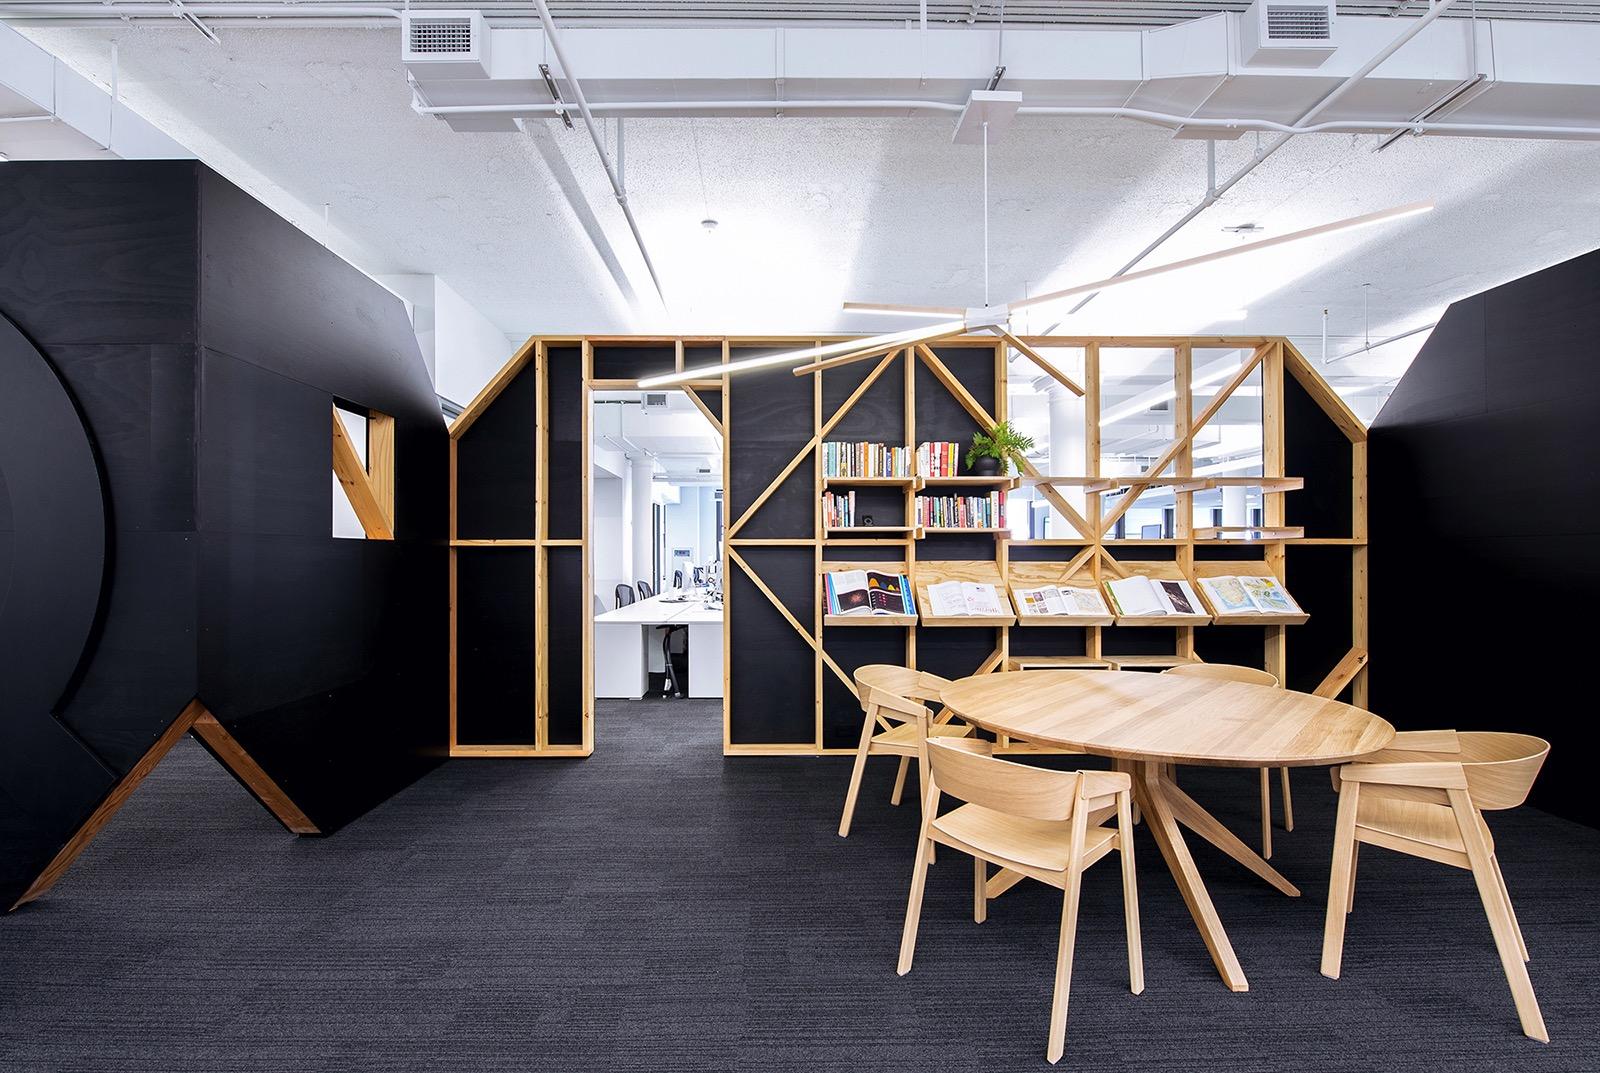 qz-office-nyc-4